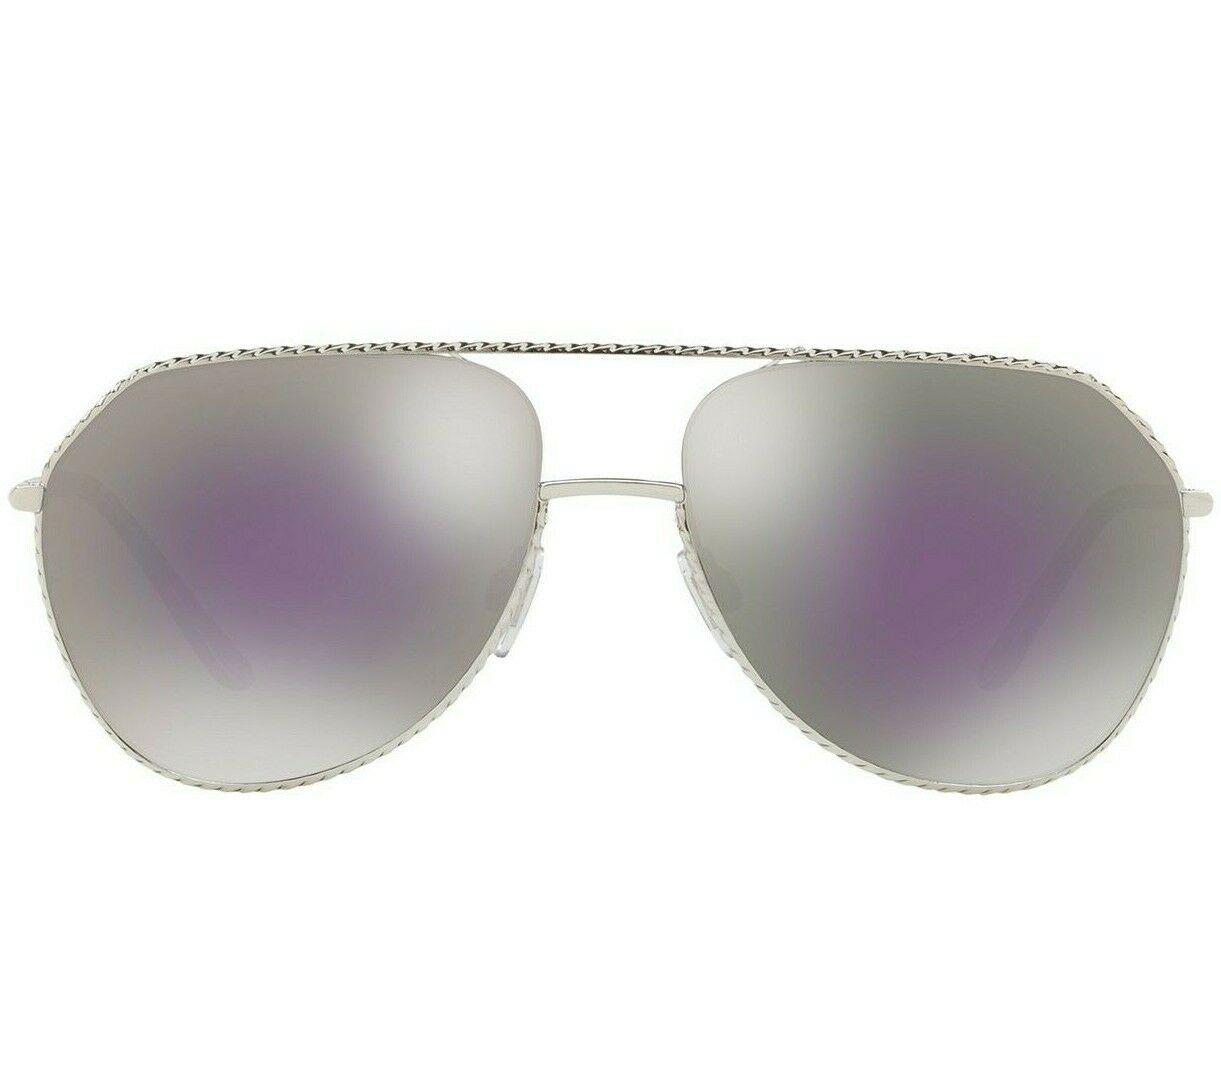 Dolce & Gabbana Pilot DG2191  Silver Frame Lilac Grey Mirror Lens Sunglasses image 2